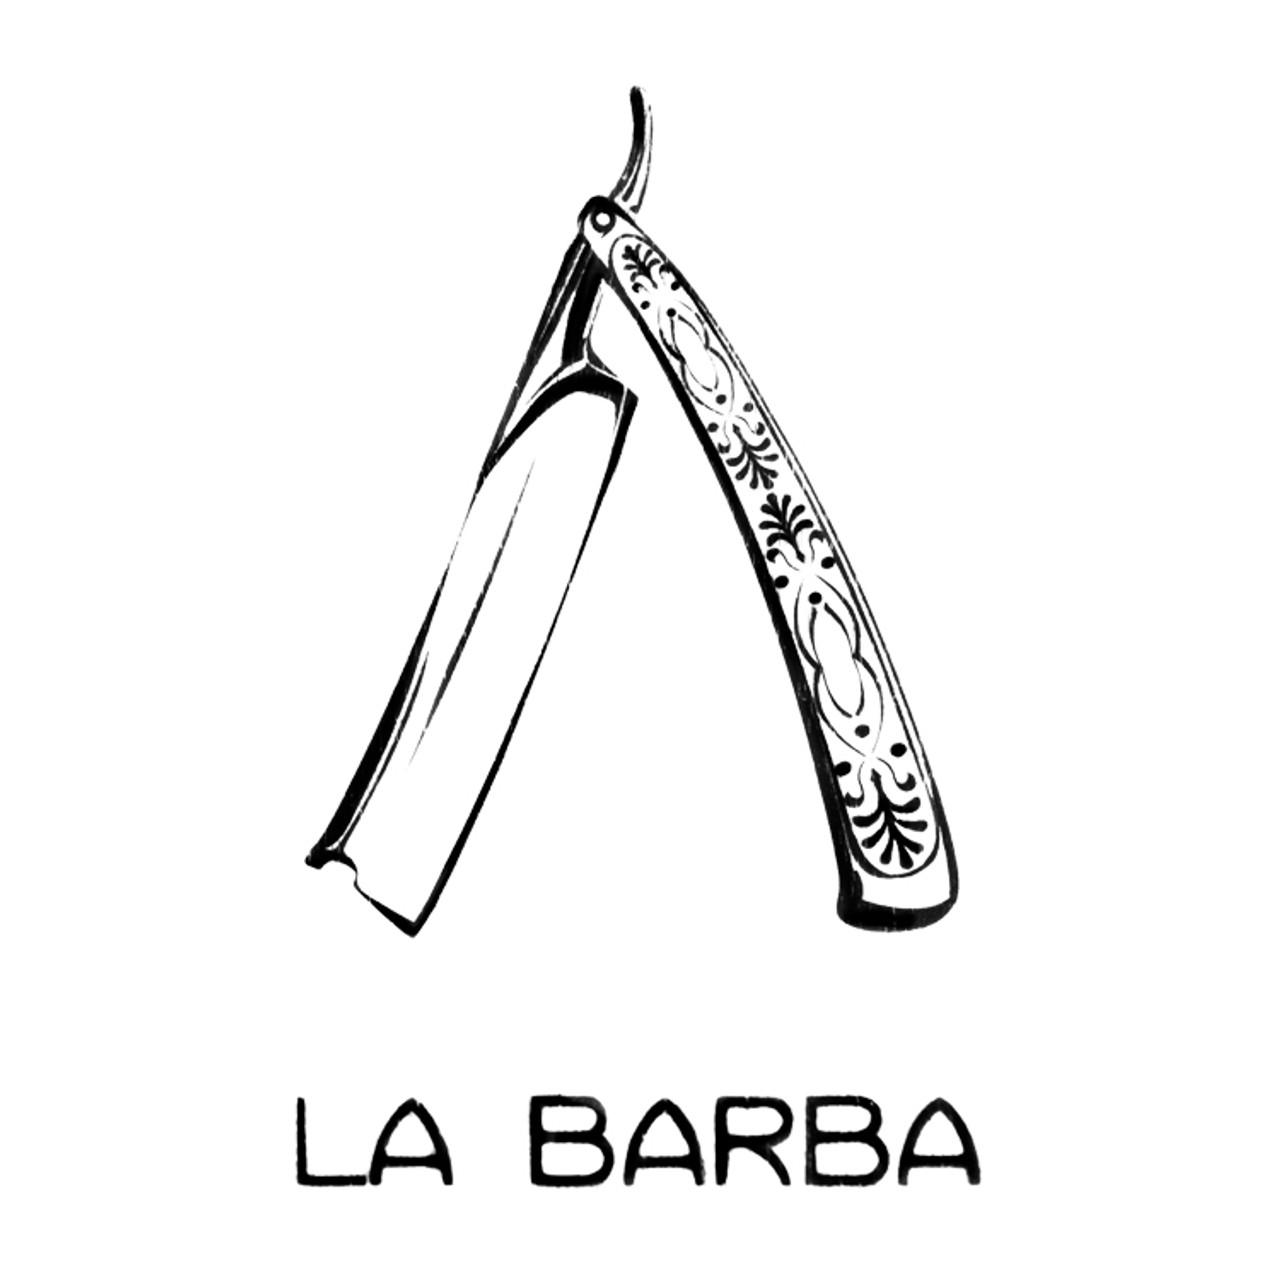 La Barba Purple Corona Gorda Cigars - 6.75 x 46 (Box of 12)